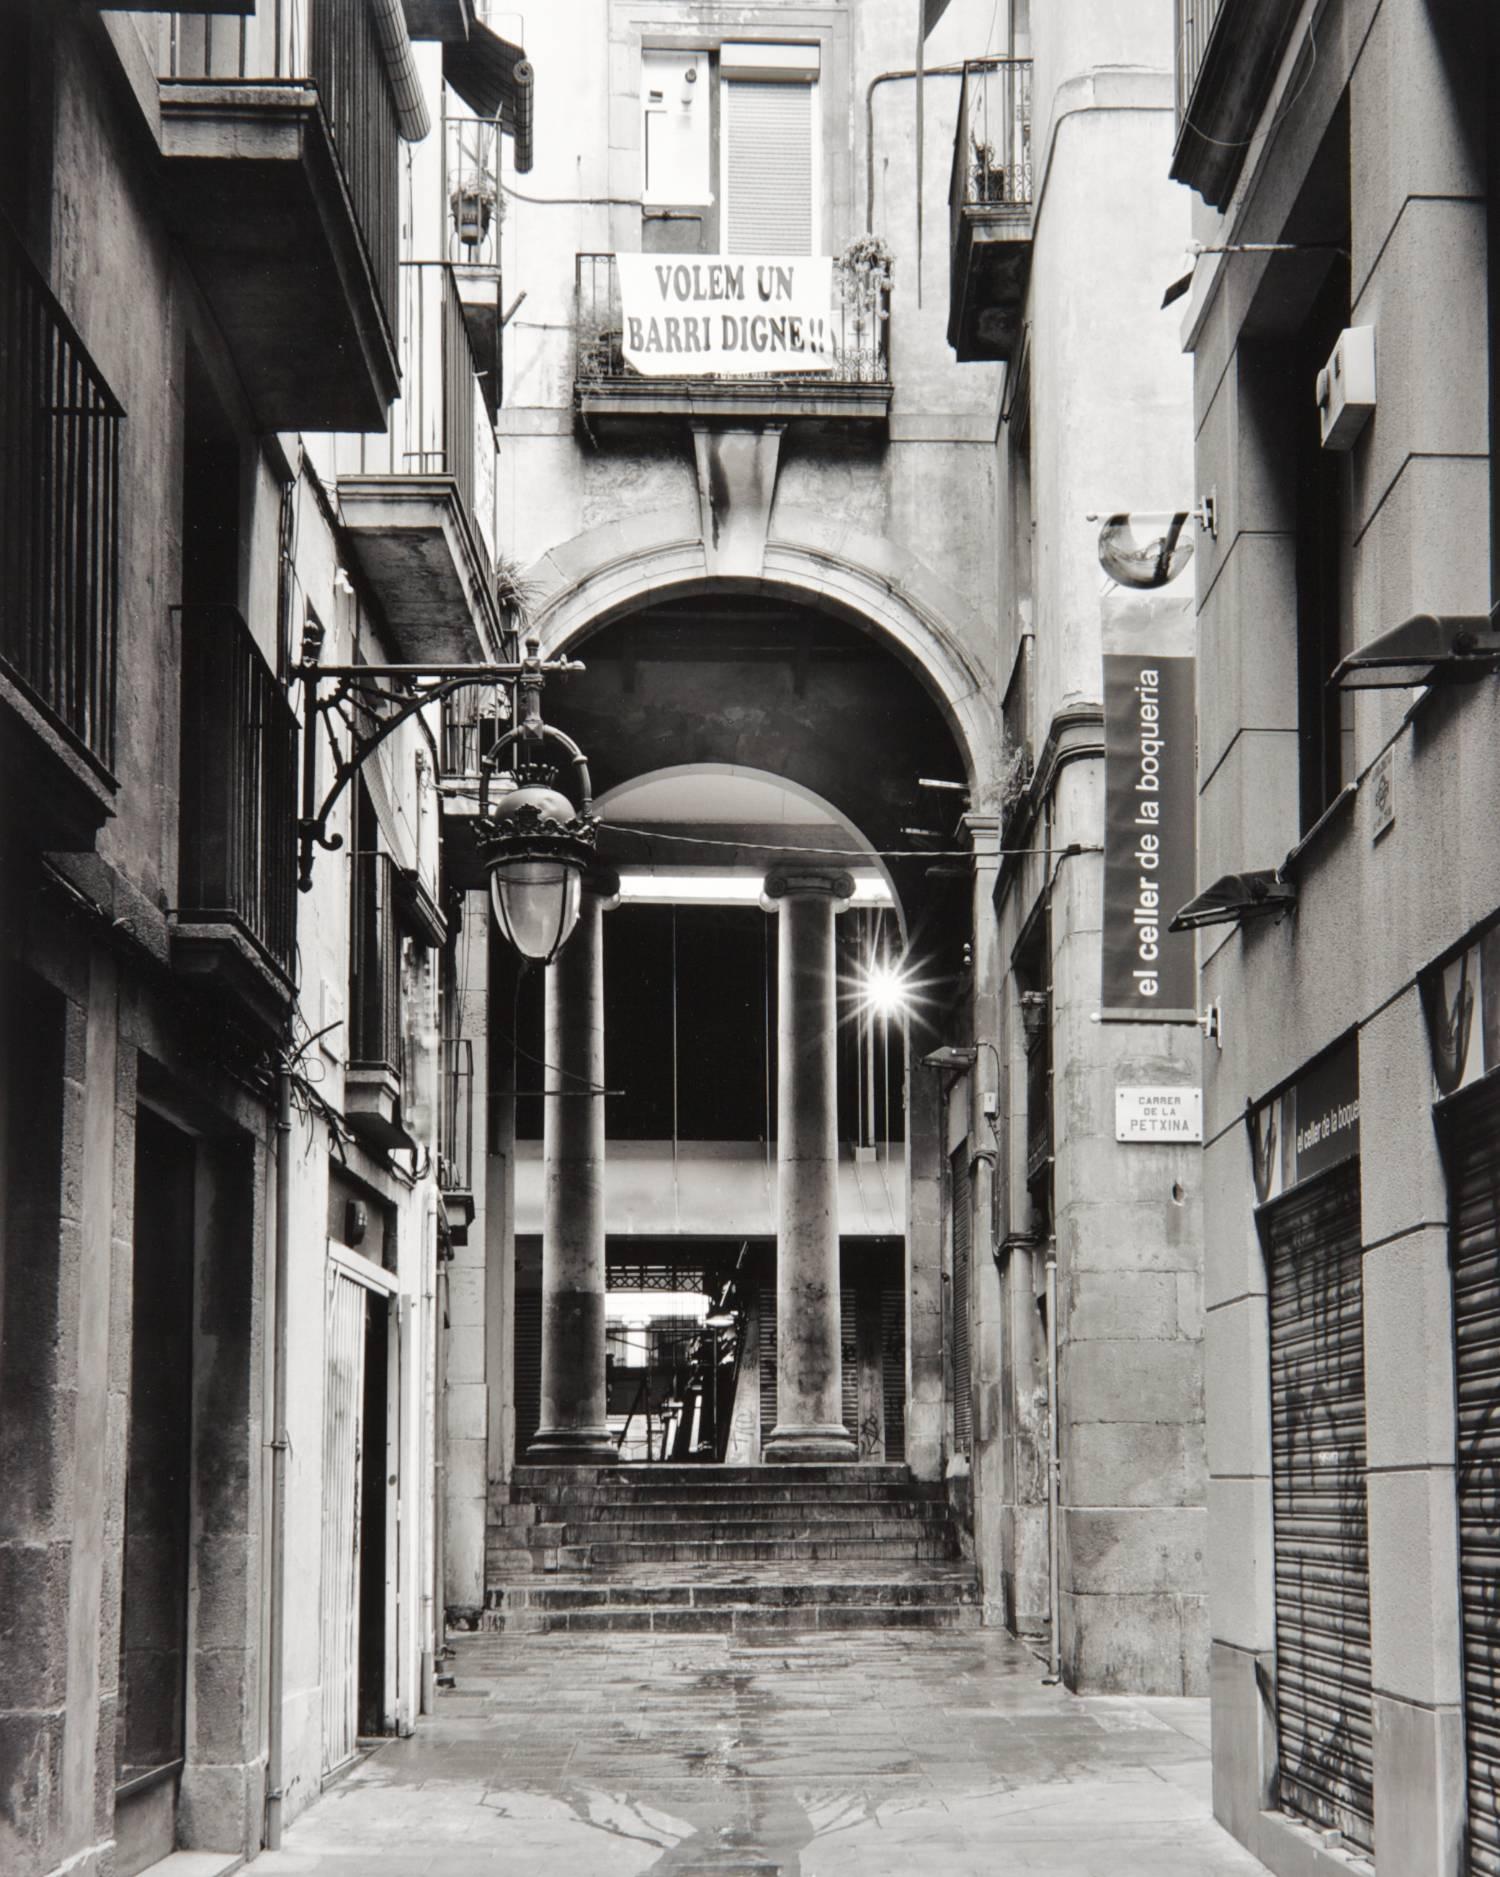 Passage in Barcelona (Spain)